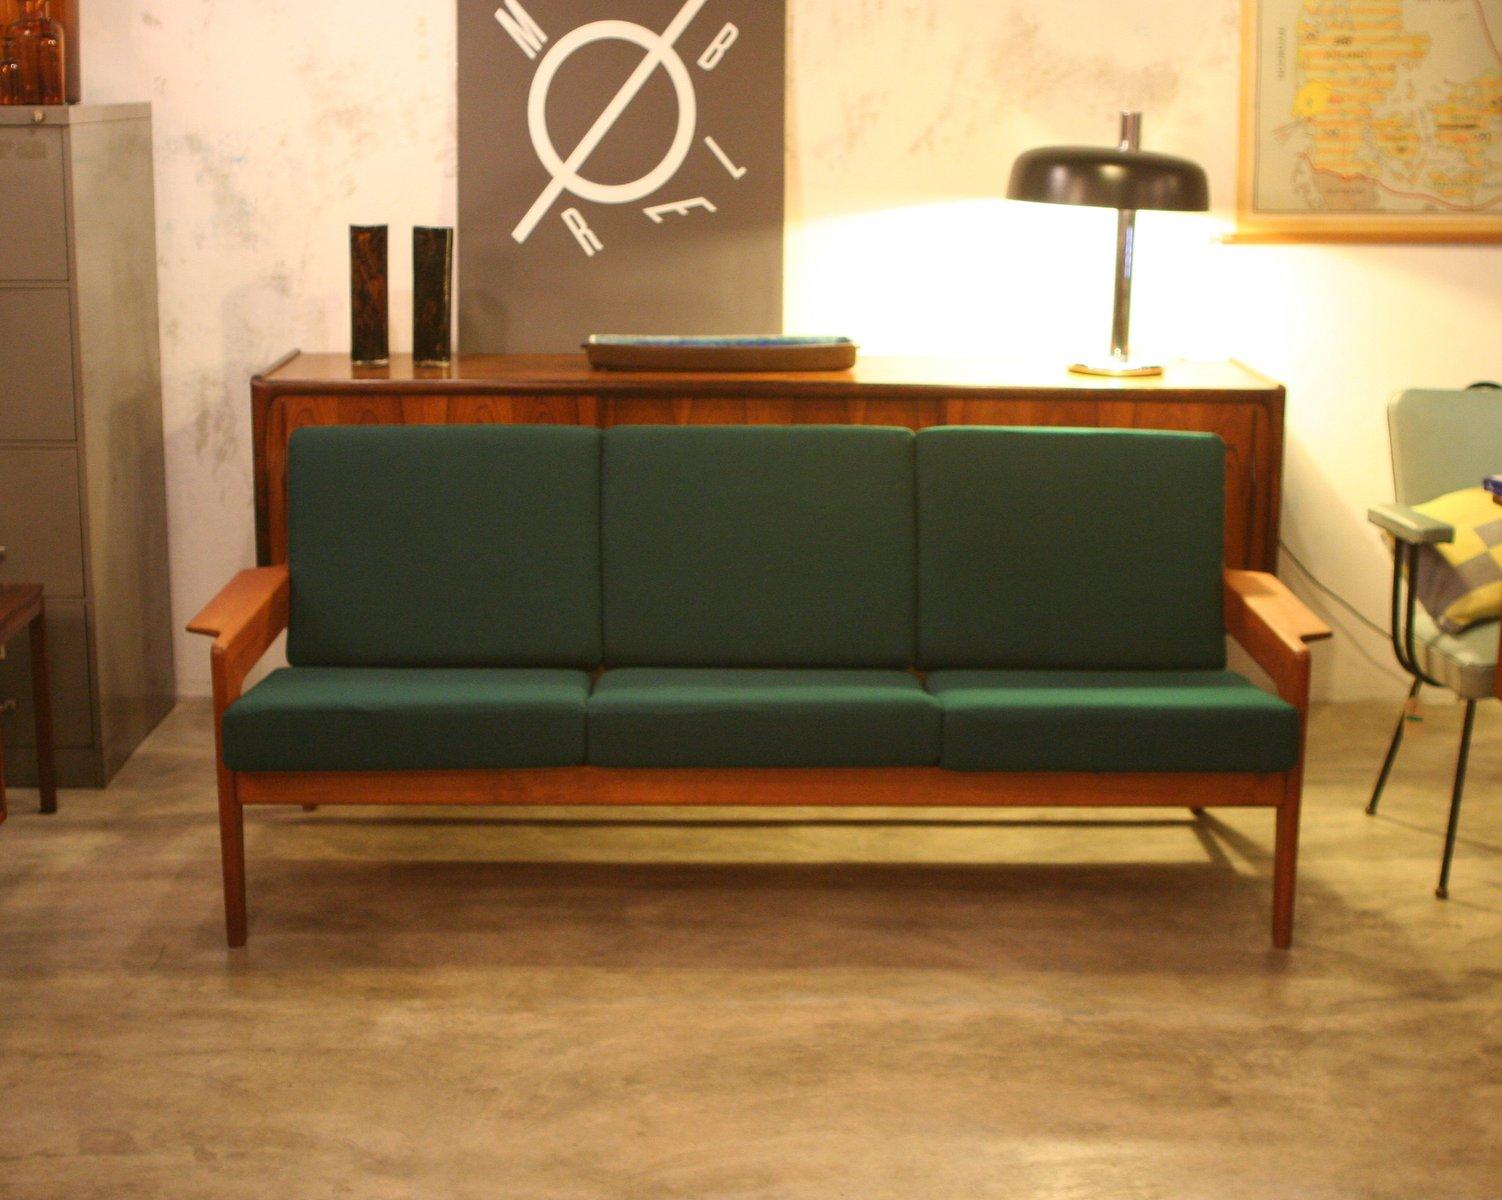 Danish Teak Sofa By Arne Wahl Iversen For Komfort 1960s For Sale At Pamono